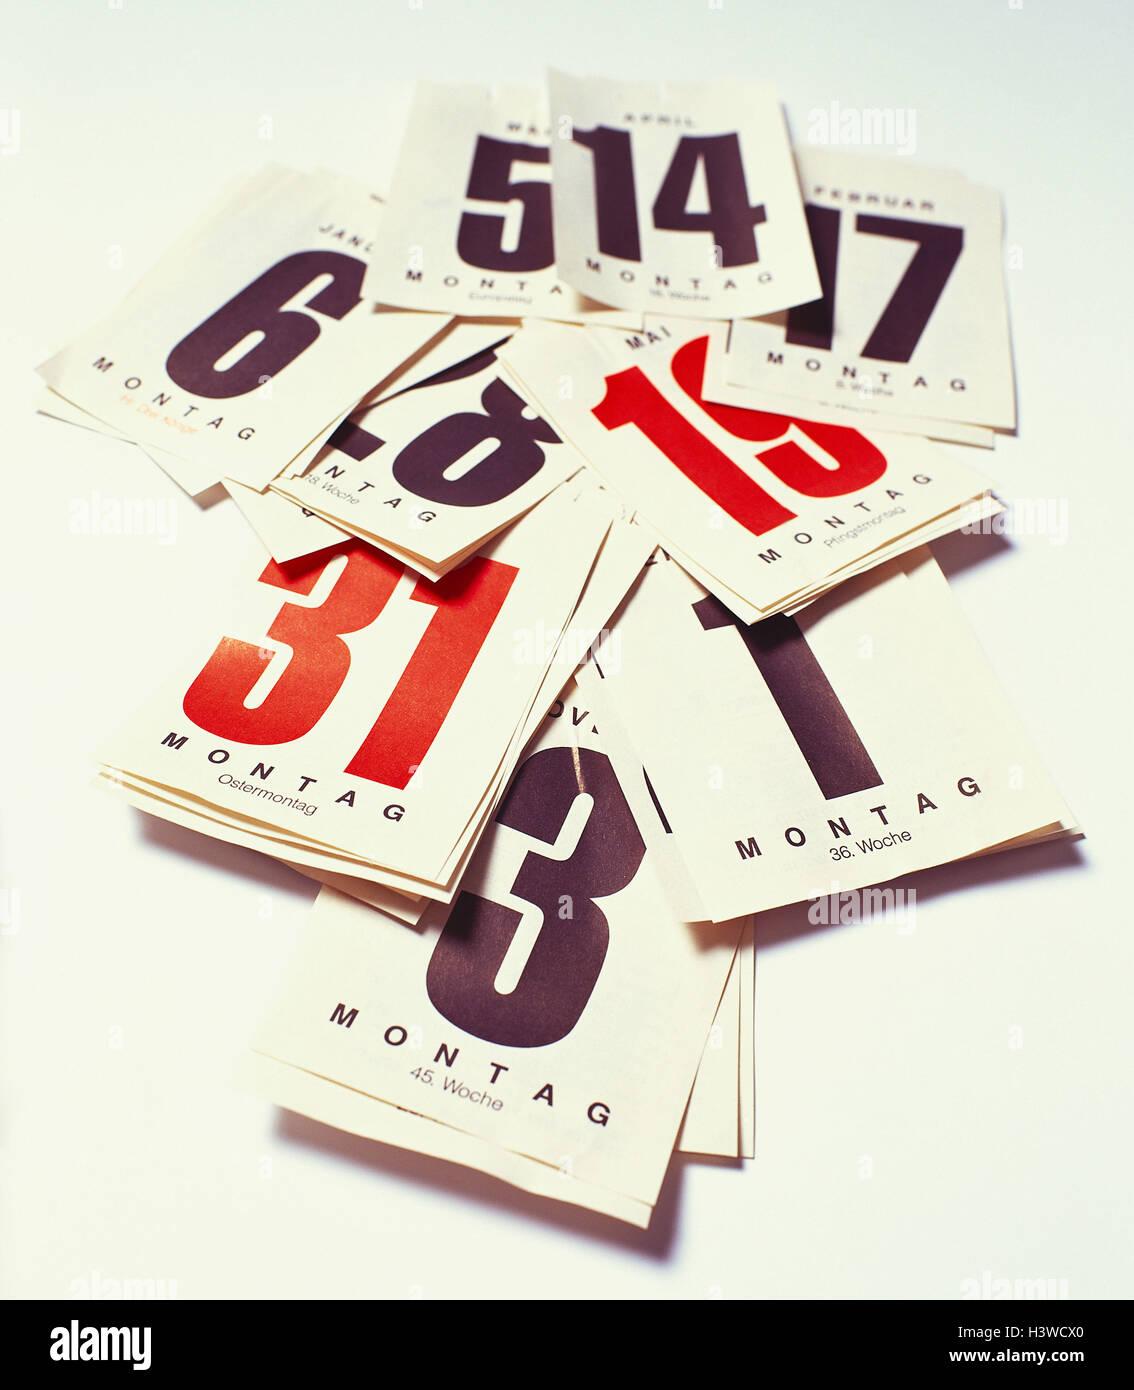 Calendar, detail, calendar leaves, ragged datum, calendar leaves, red, black, Sundays, days, weekdays, batches, - Stock Image